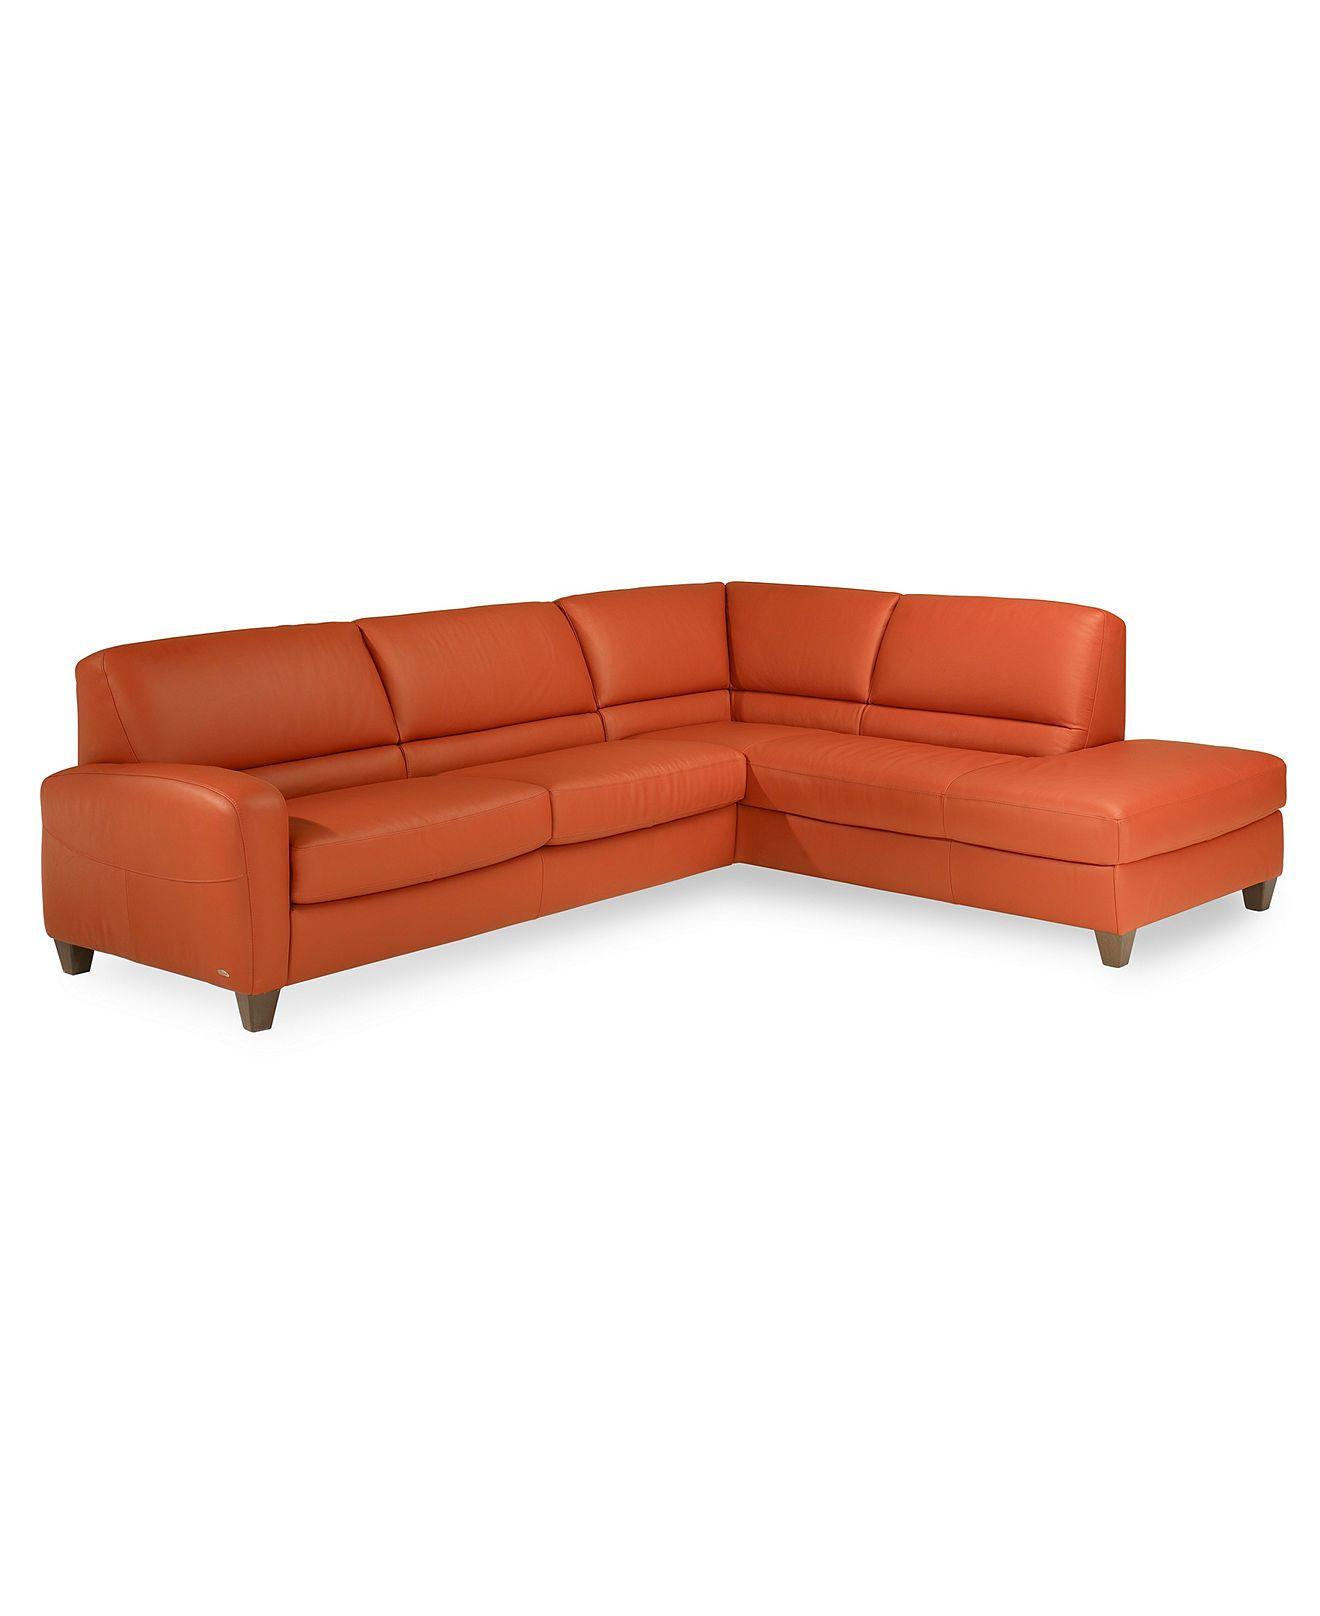 italsofa | 144 [LR] | Sectional sofa, Sectional sleeper sofa ...